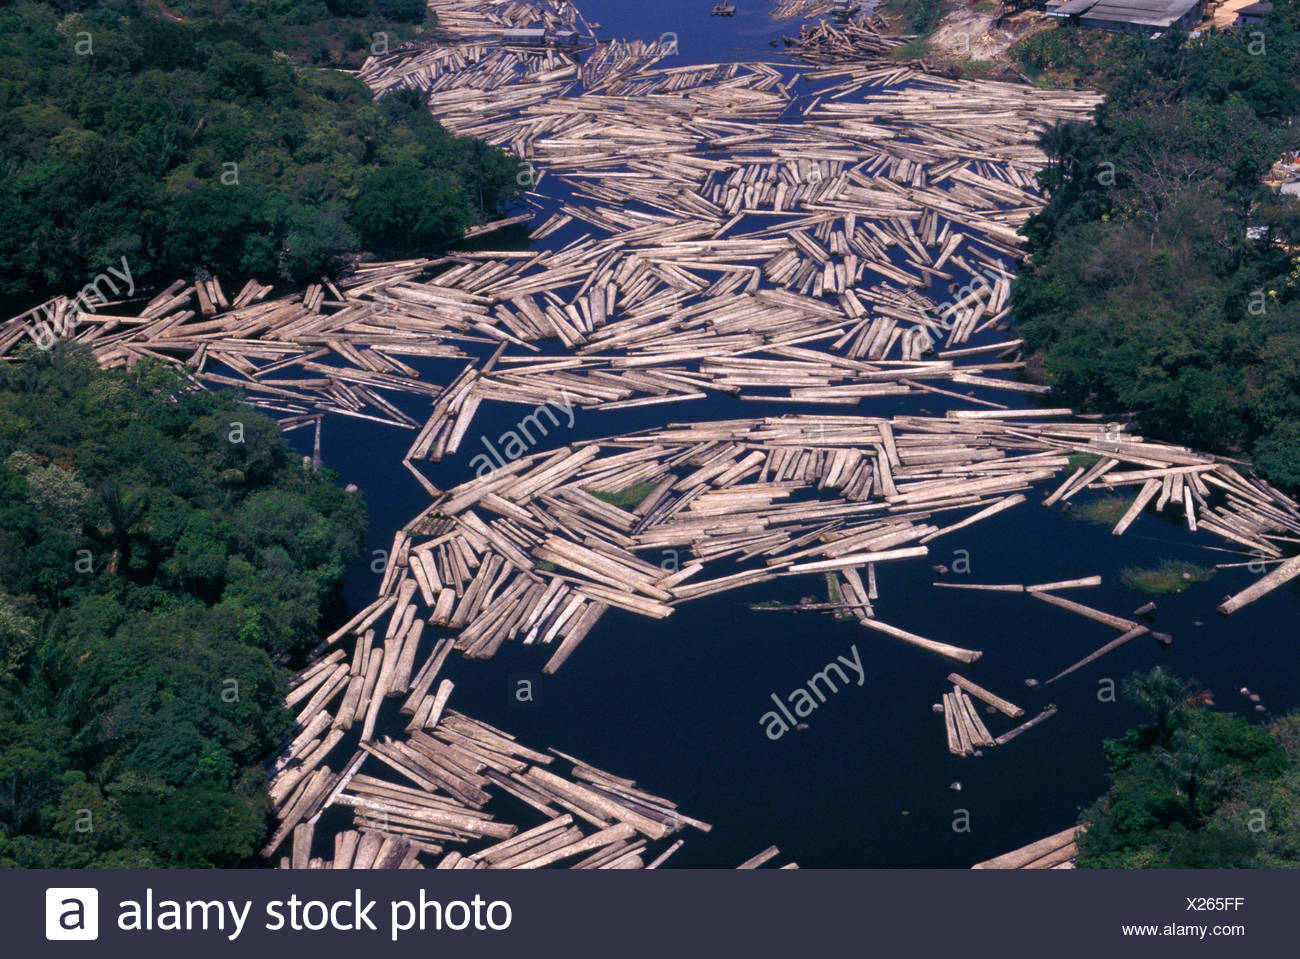 Amazon rainforest, Brazil. Transport of truncks in the rivers. - Stock Image